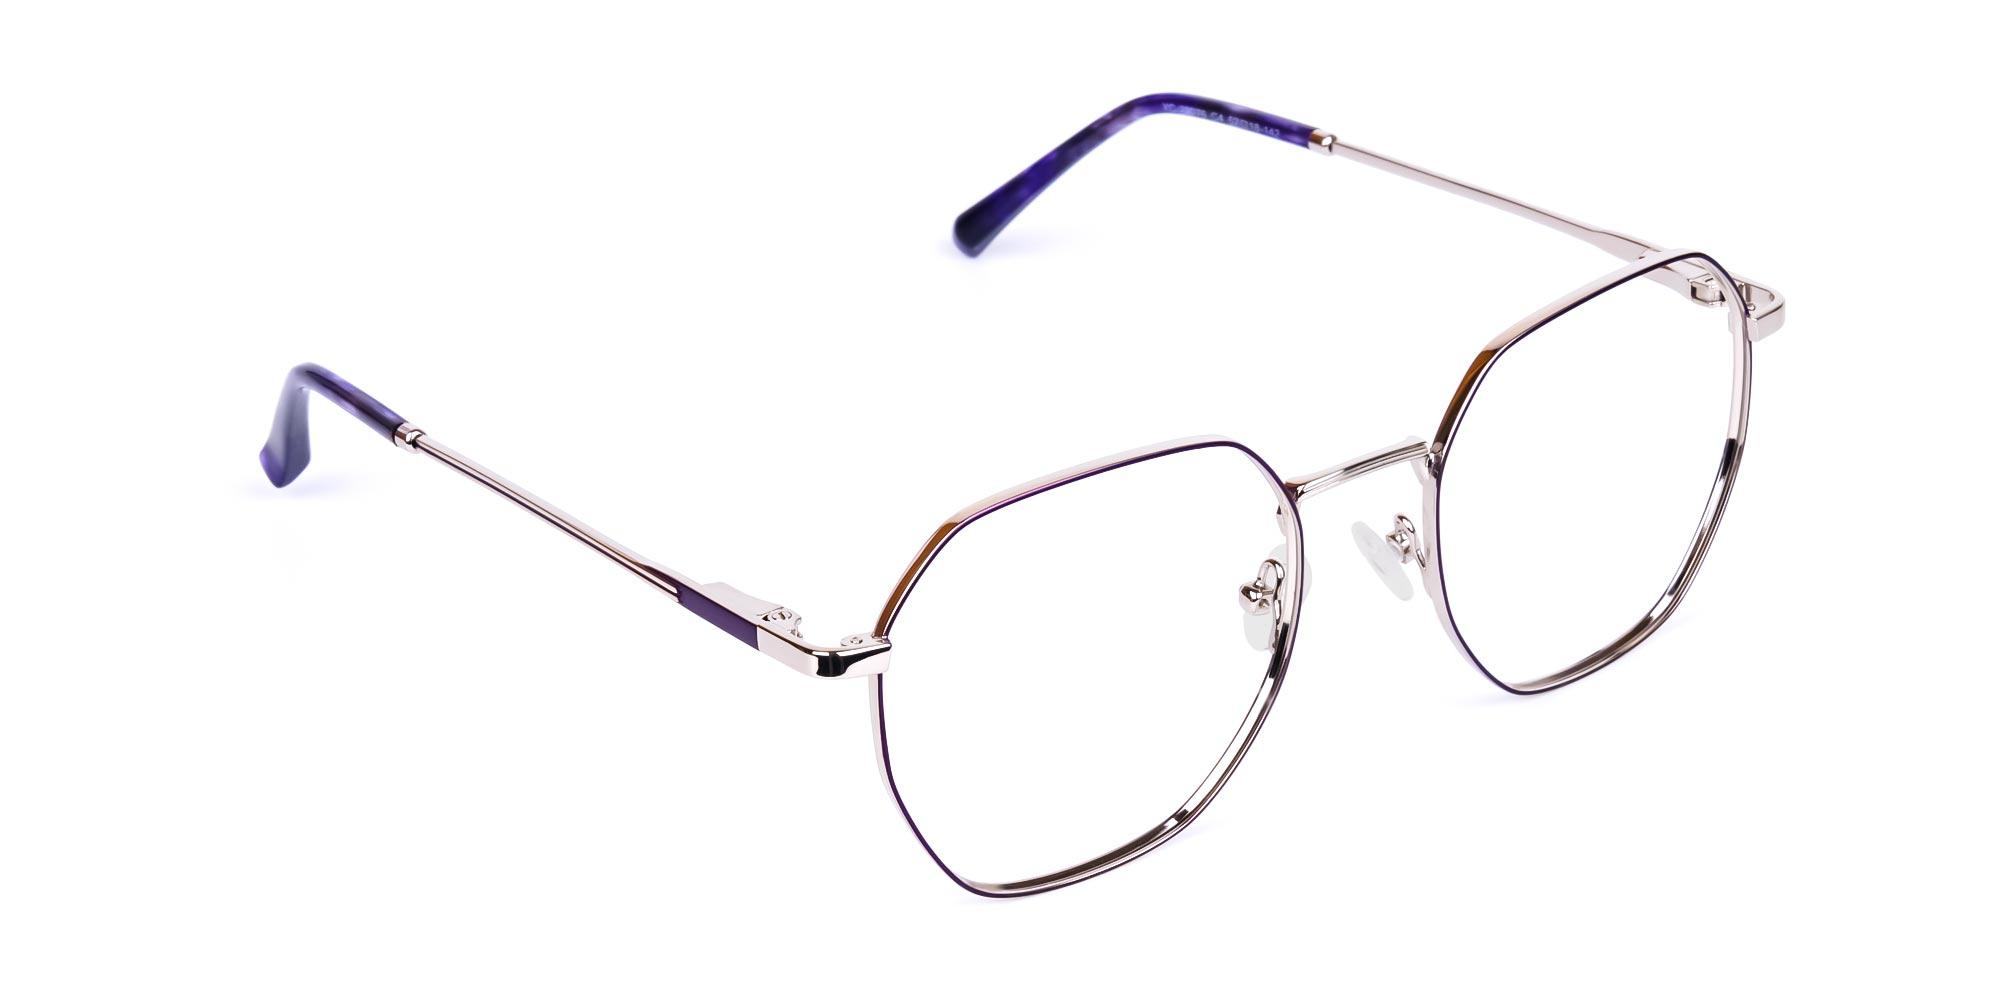 dark-violet-and-silver-geometric-shape-glasses